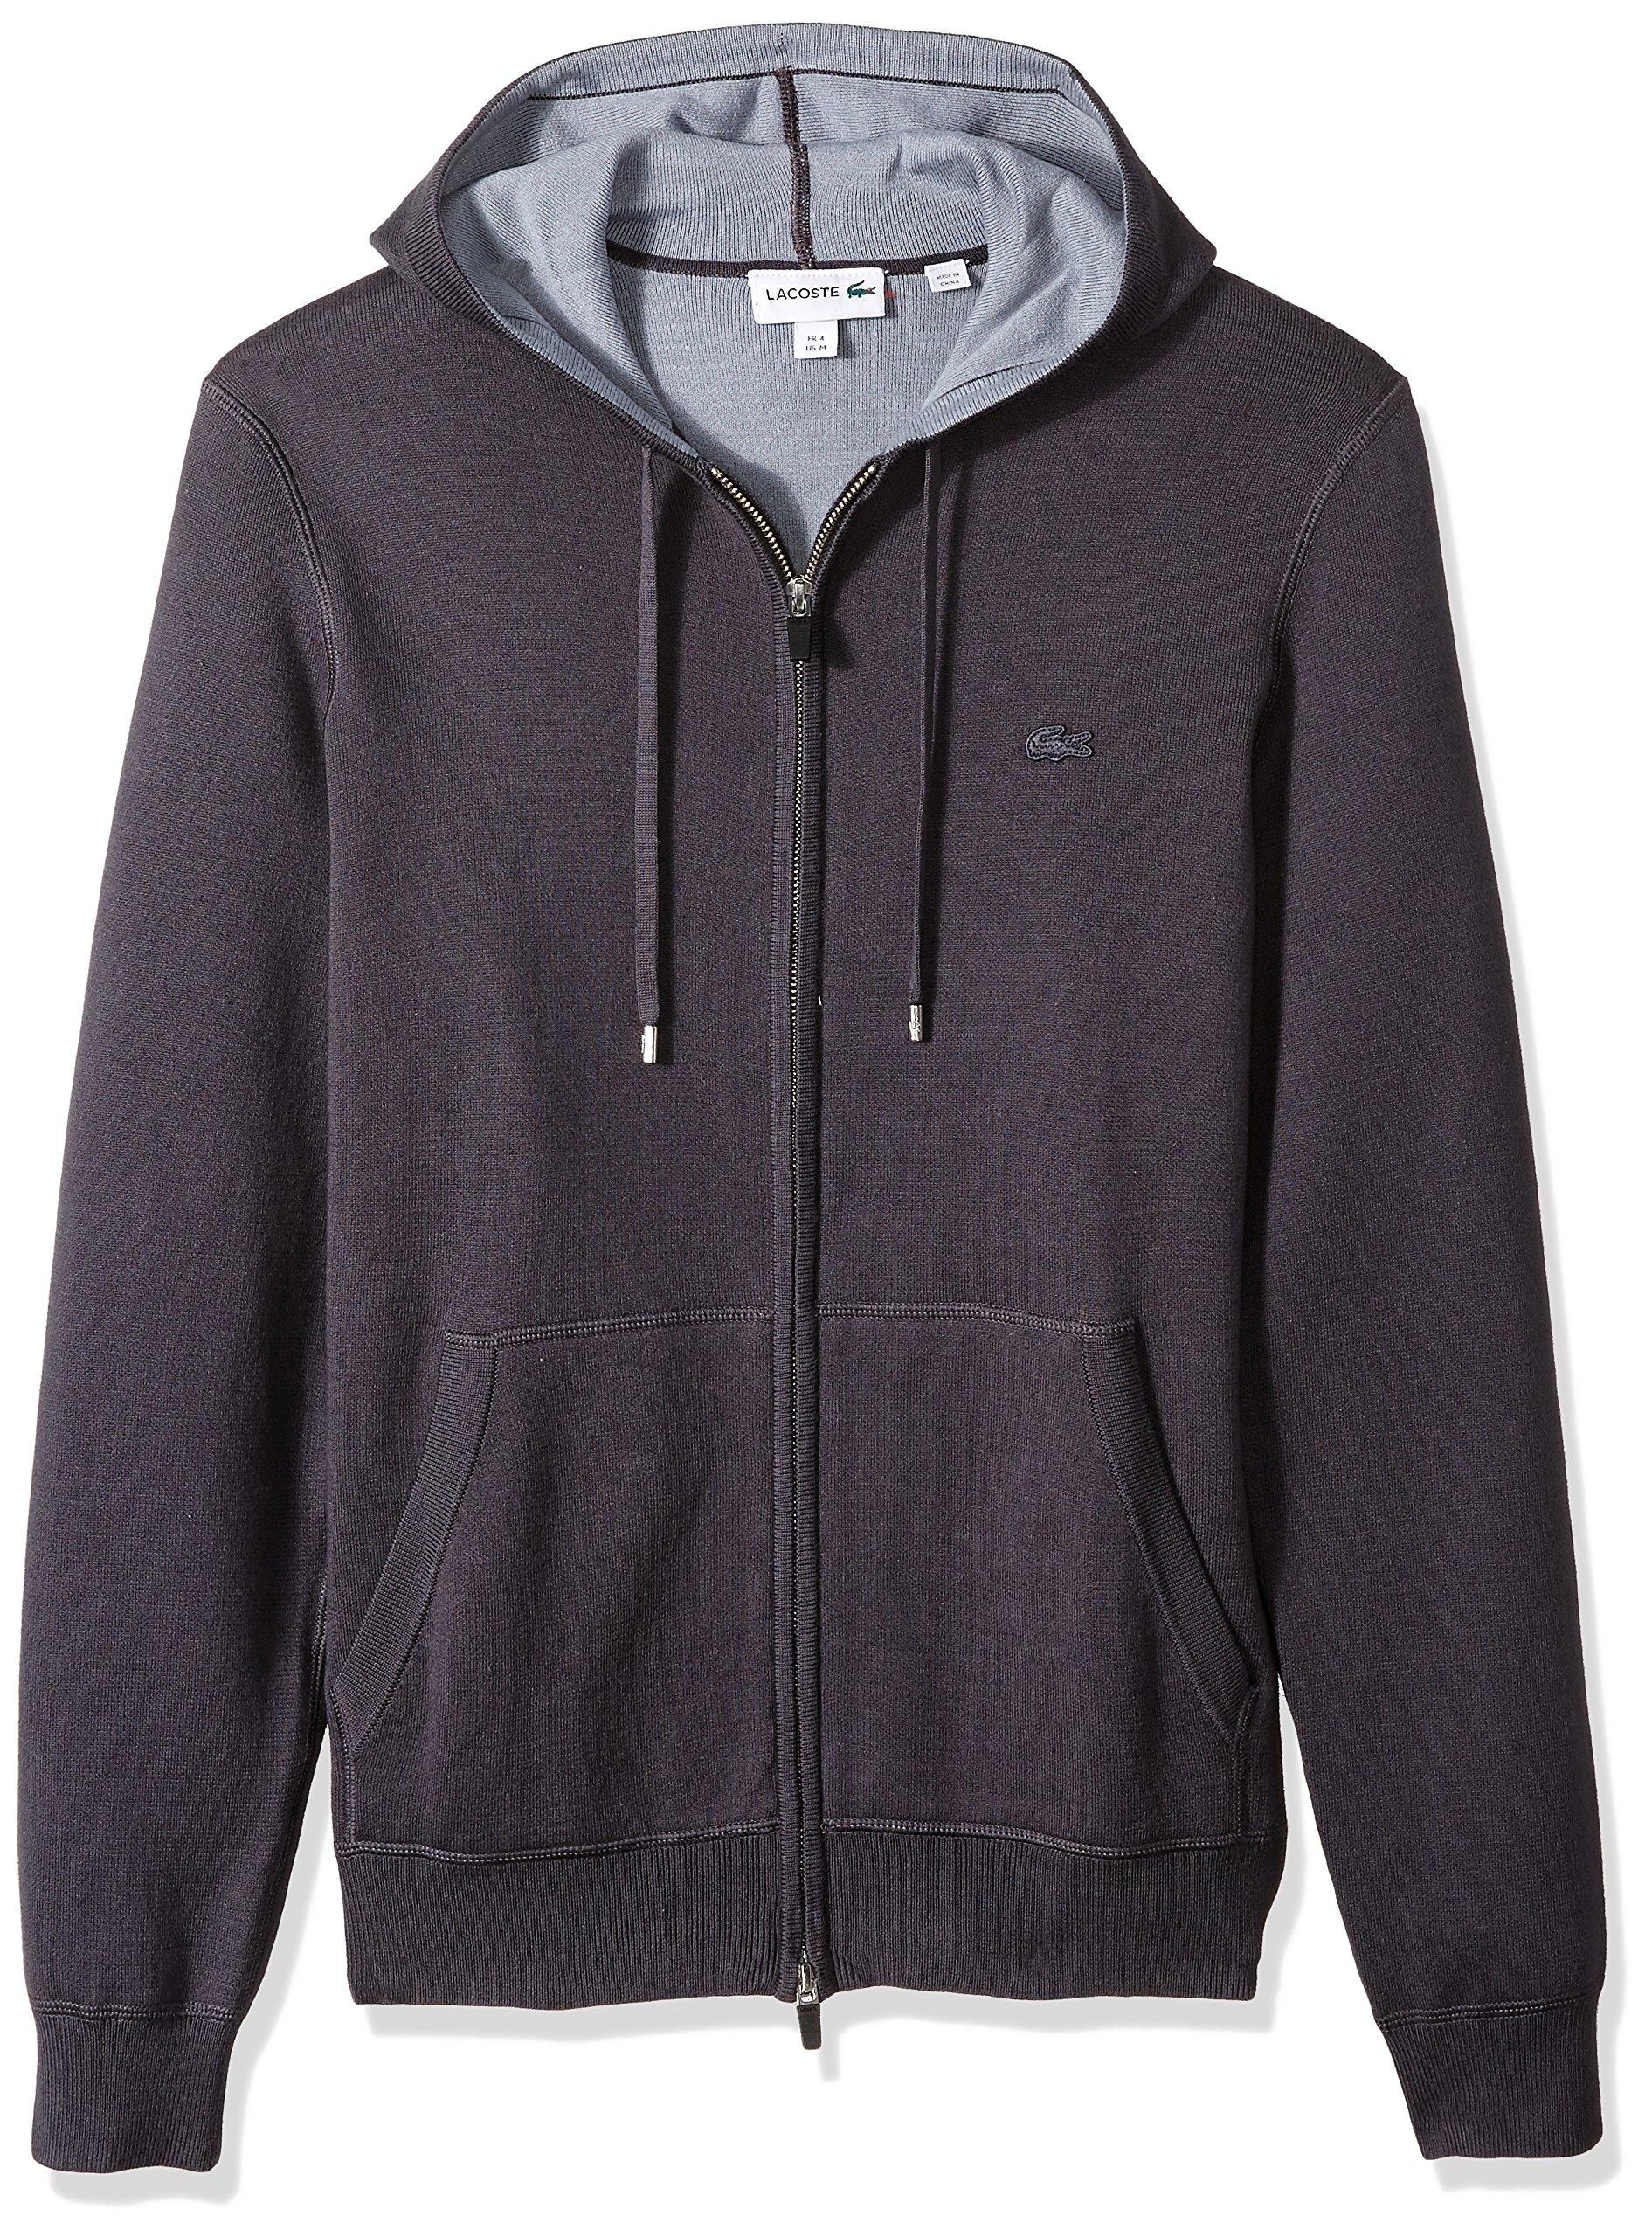 Lacoste Men's Doubleface Cotton and Poly Hoddie Full Zip Sweatshirt, Graphite/Mill Blue, 5